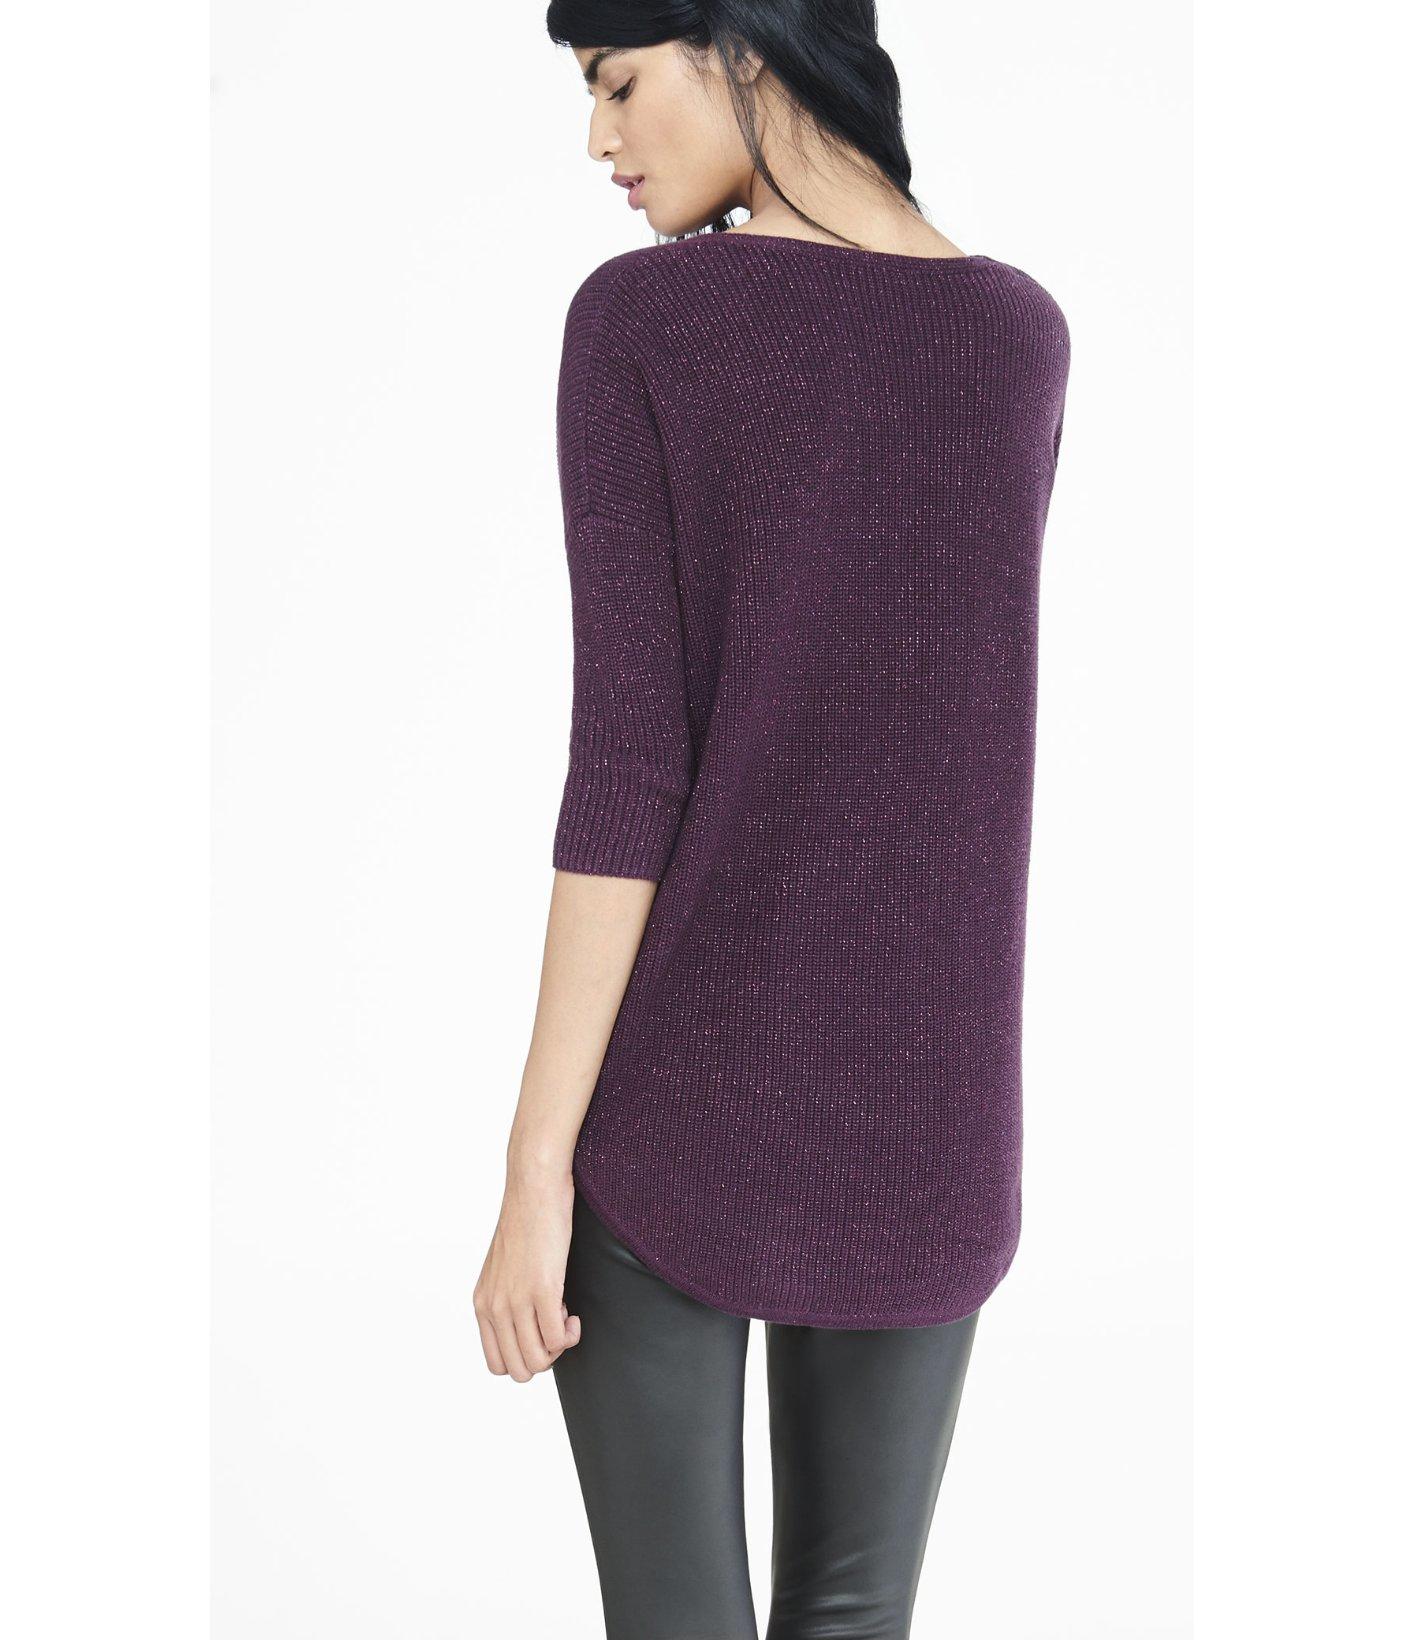 Express Currant Metallic London Tunic Sweater in Purple | Lyst